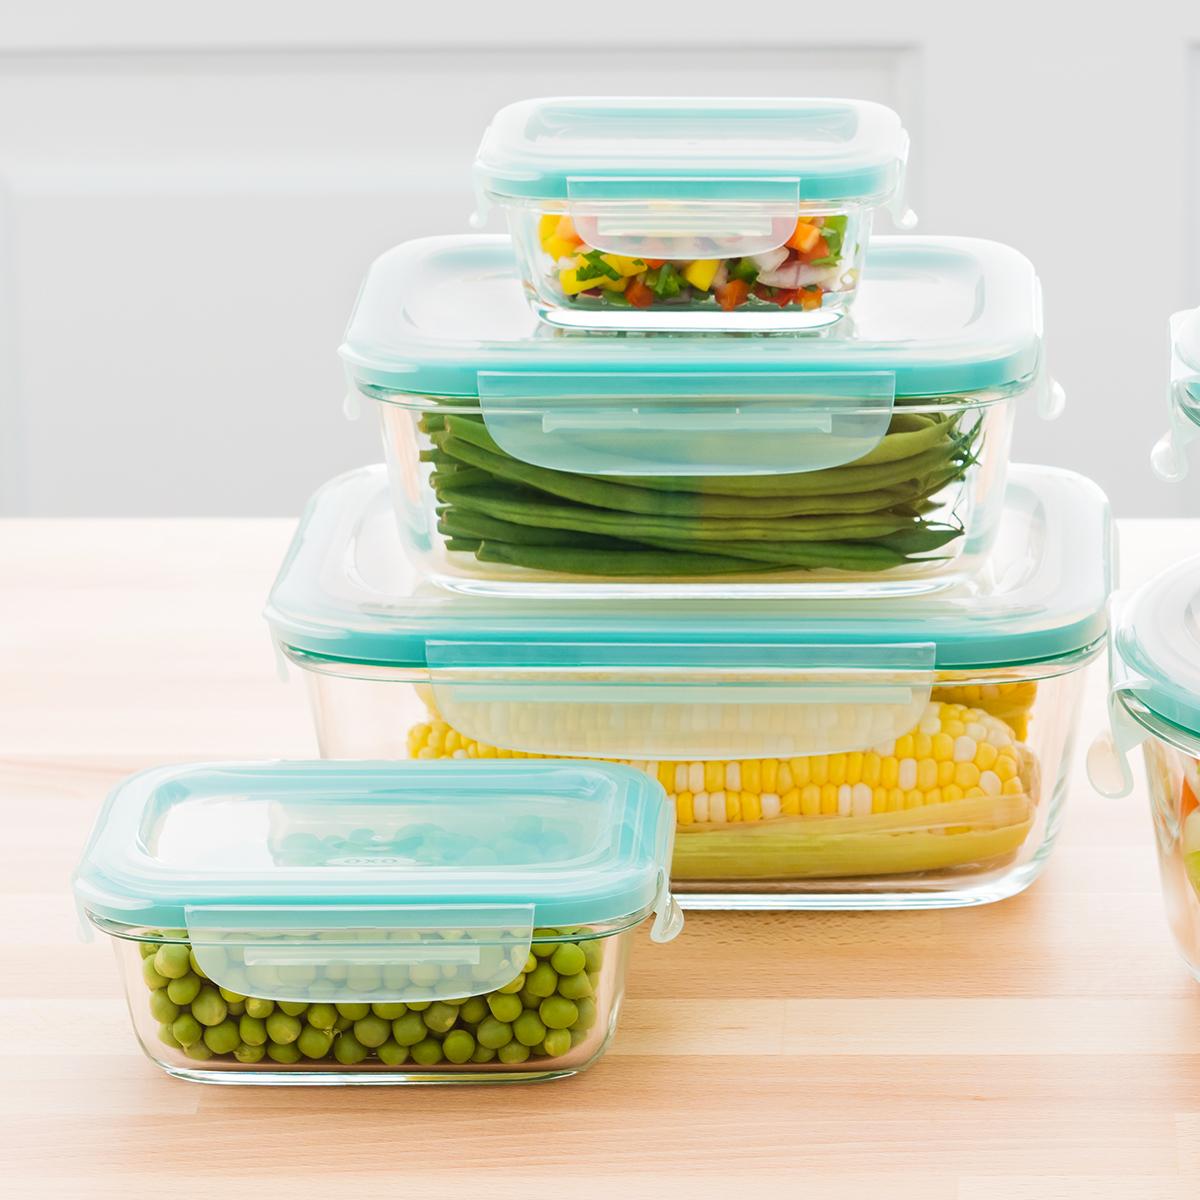 OXO Good Grips 8-Piece Smart Seal Rectangular Glass Food Storage Set & OXO Good Grips 8-Piece Smart Seal Rectangular Glass Food Storage Set ...